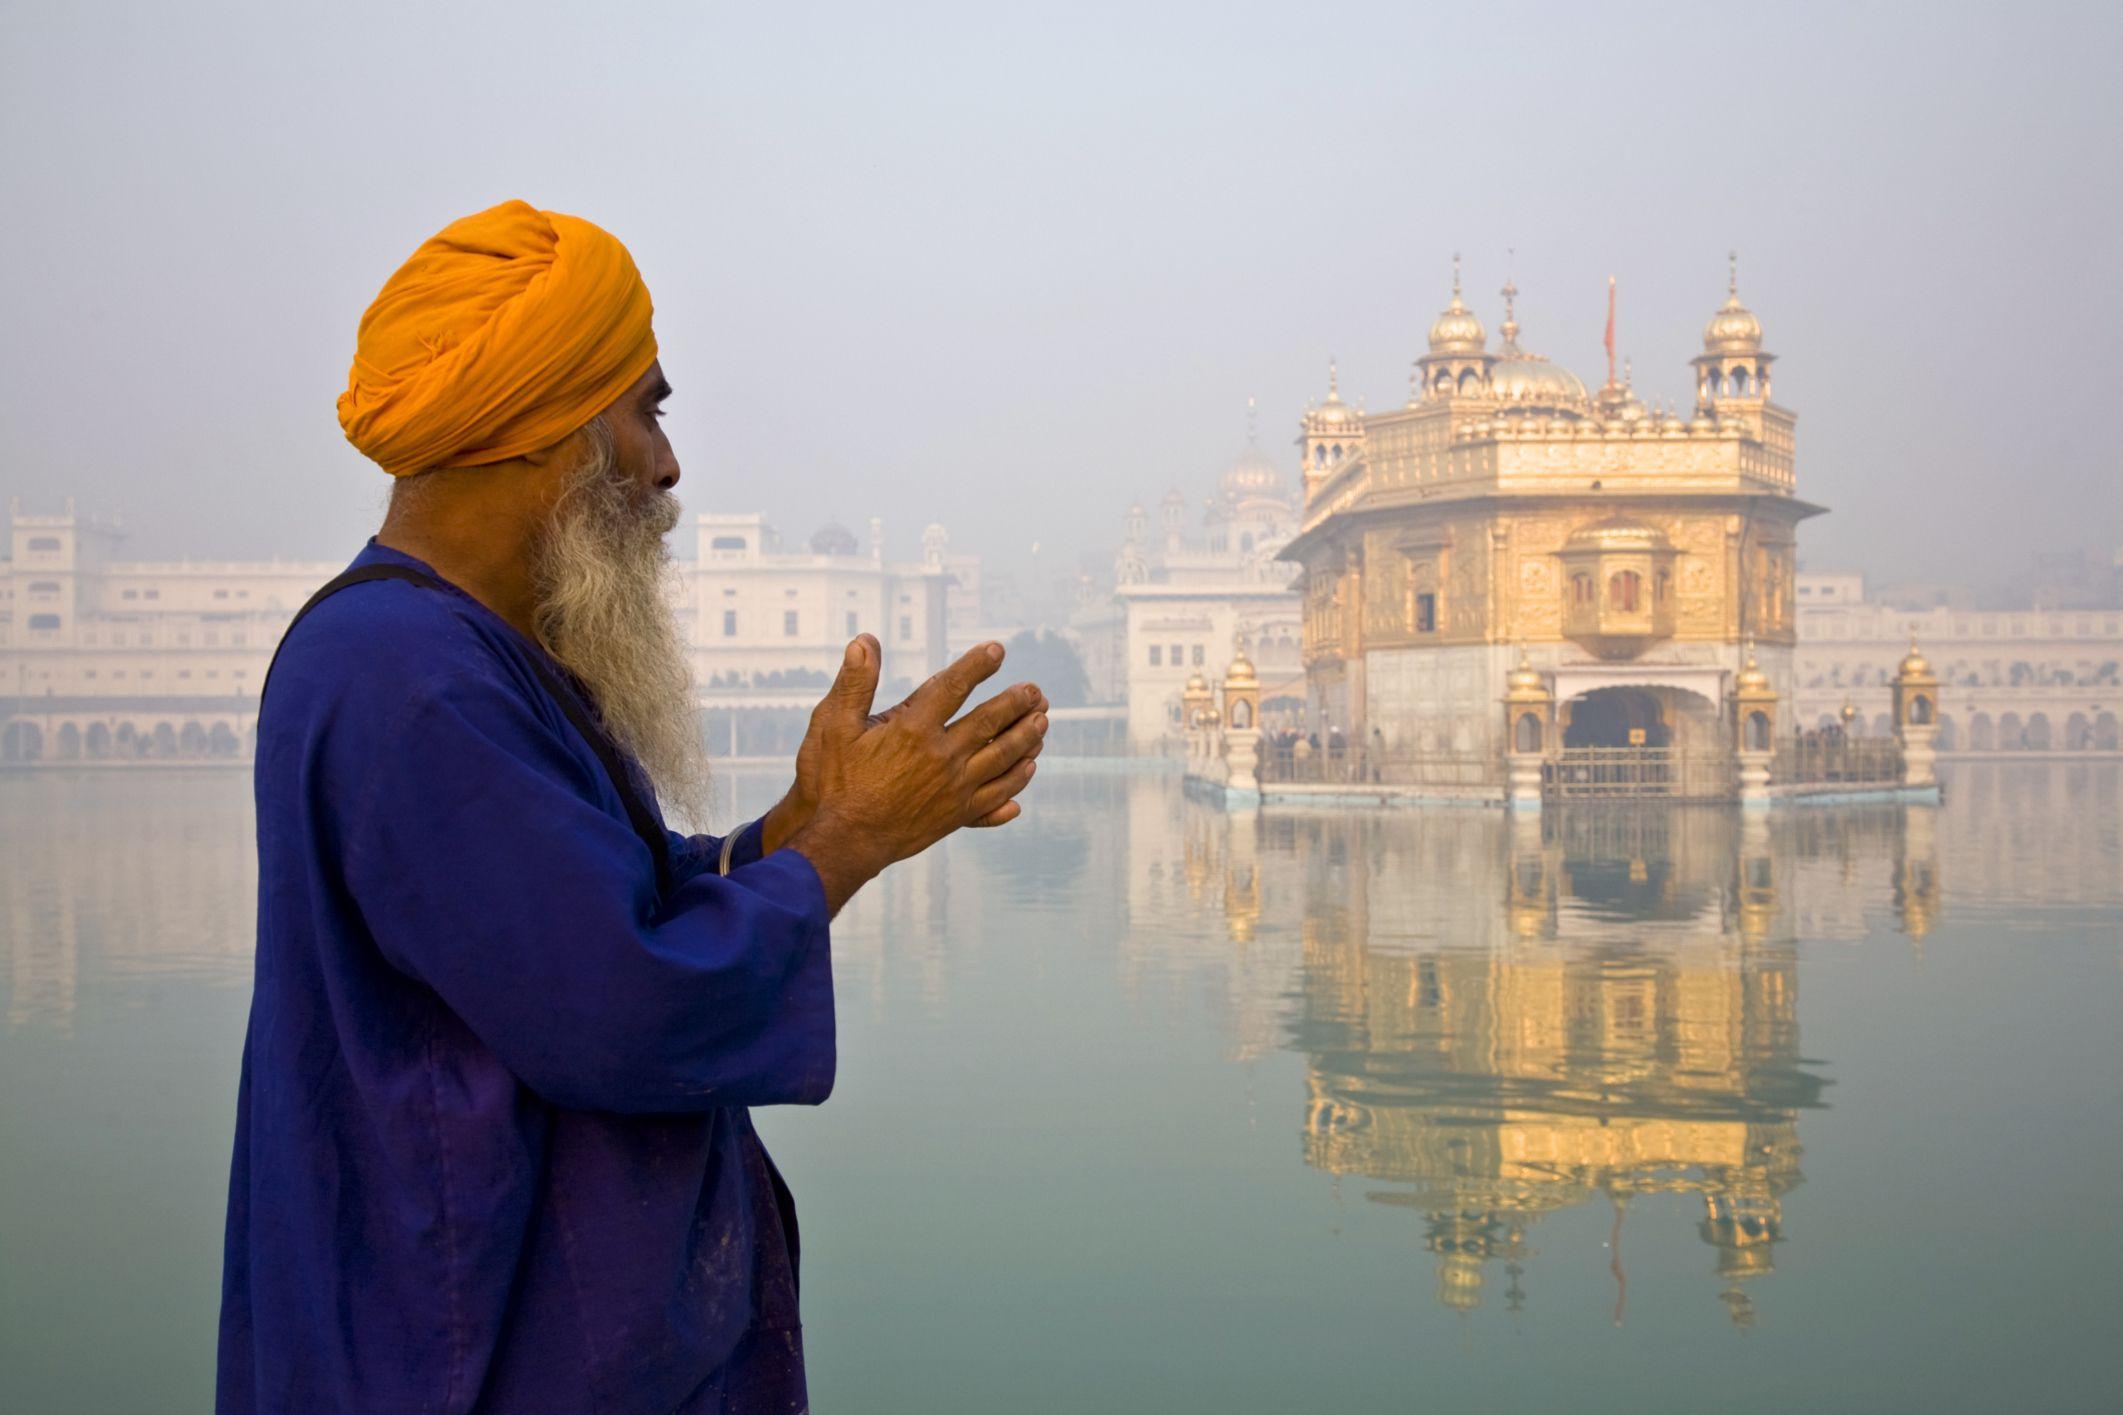 Sikhism Scriptures and Prayers